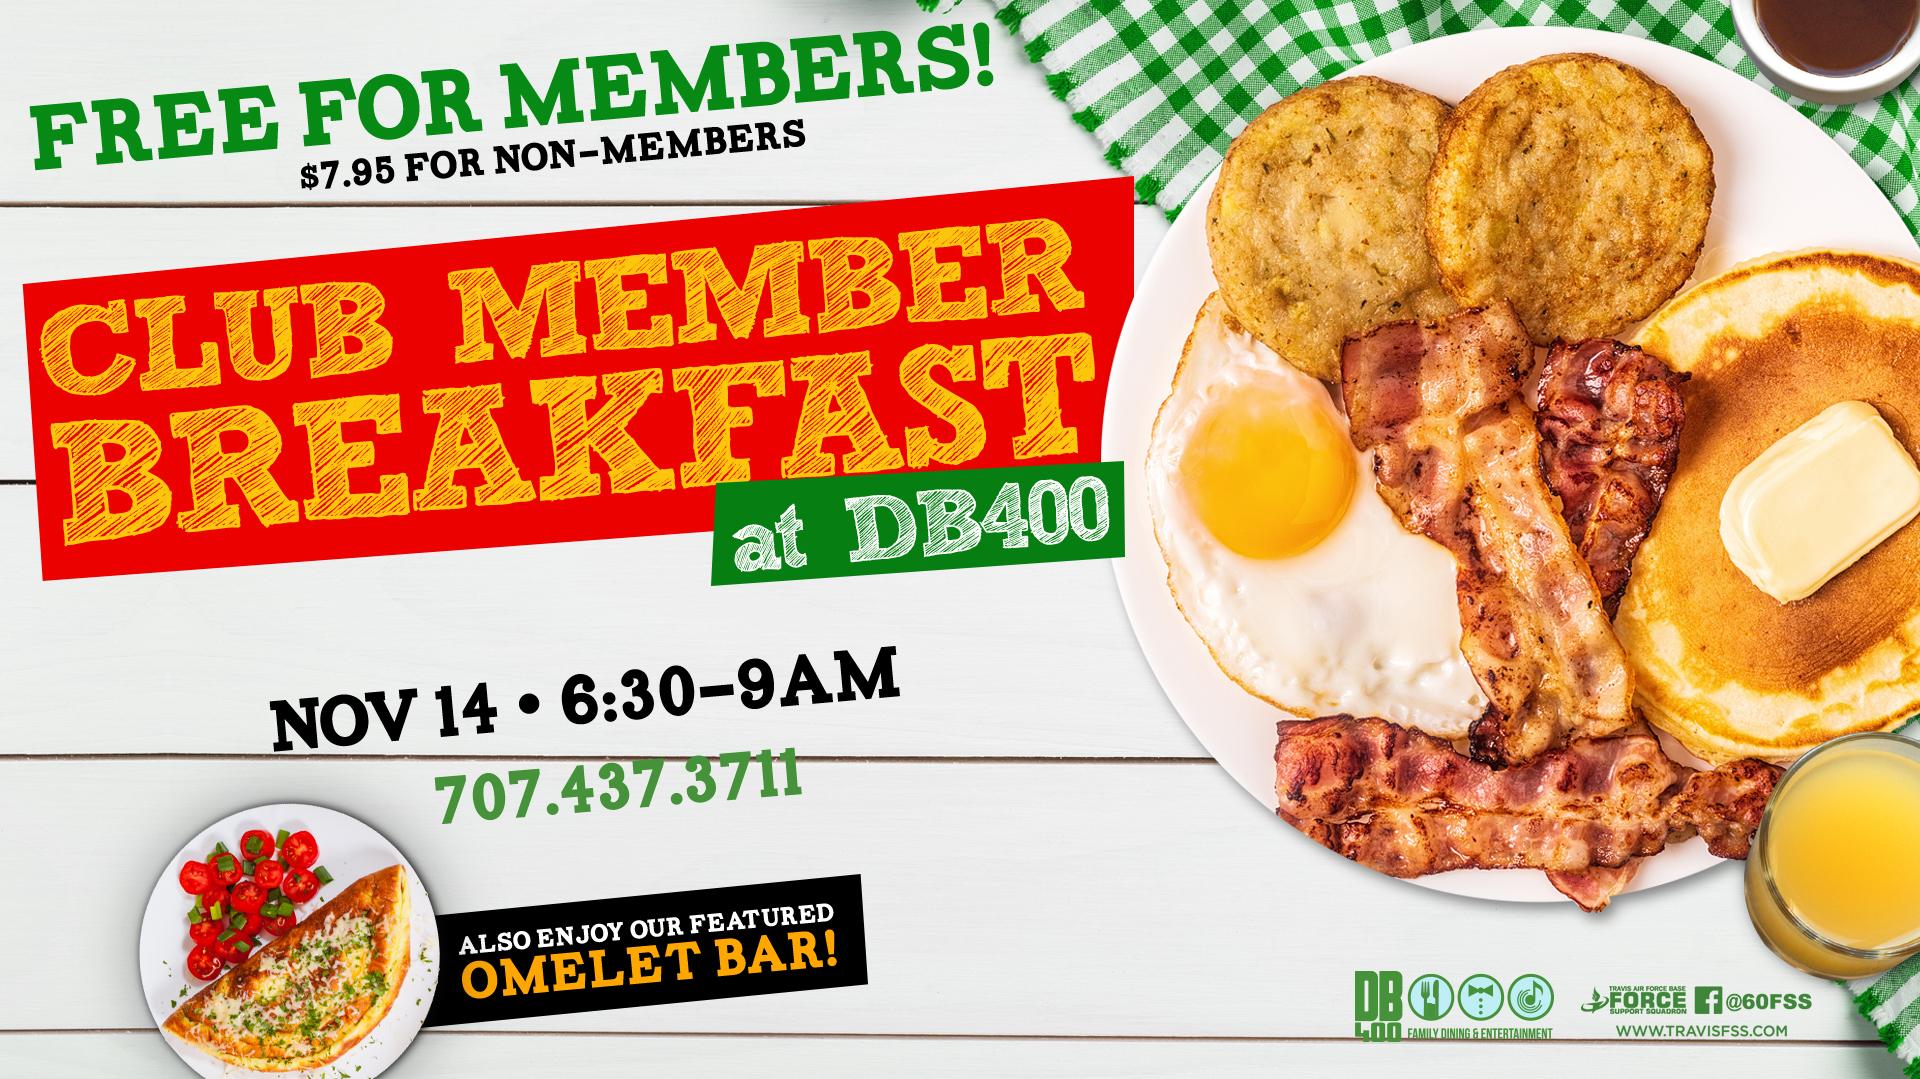 Club Member Breakfast